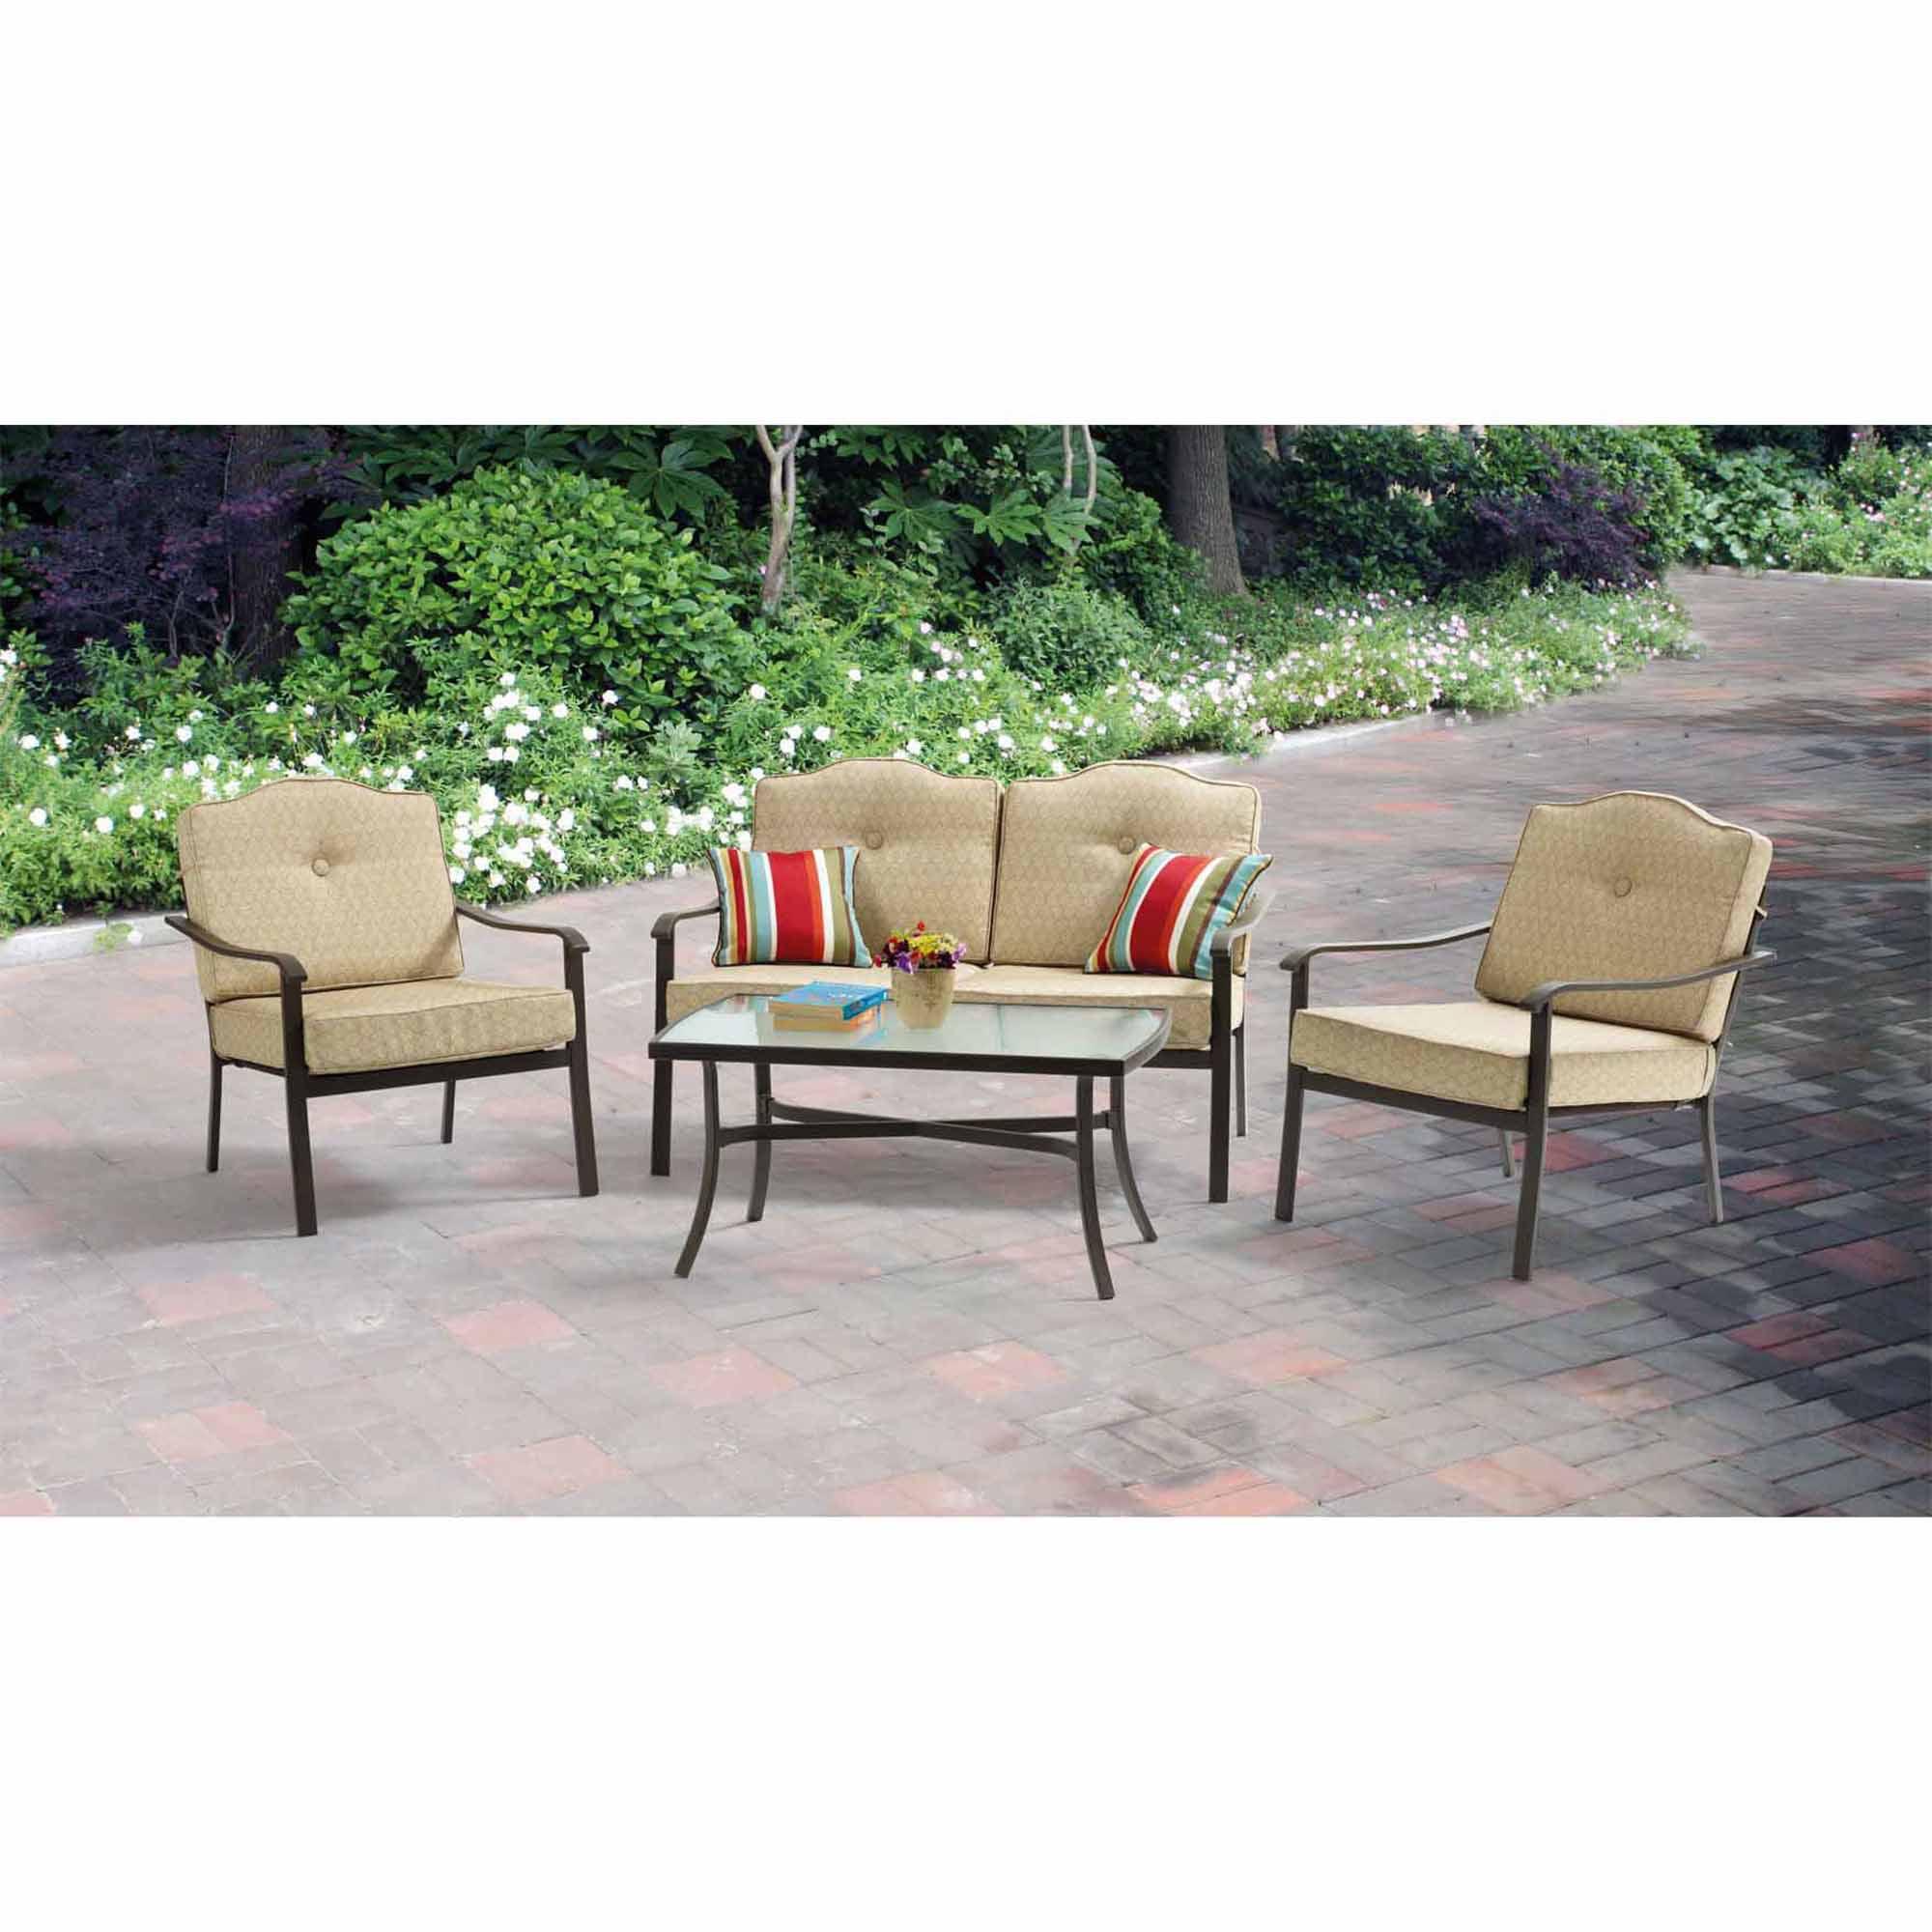 Mainstays Brookwood Landing 4-Piece Patio Conversation Set, Tan, Seats 4